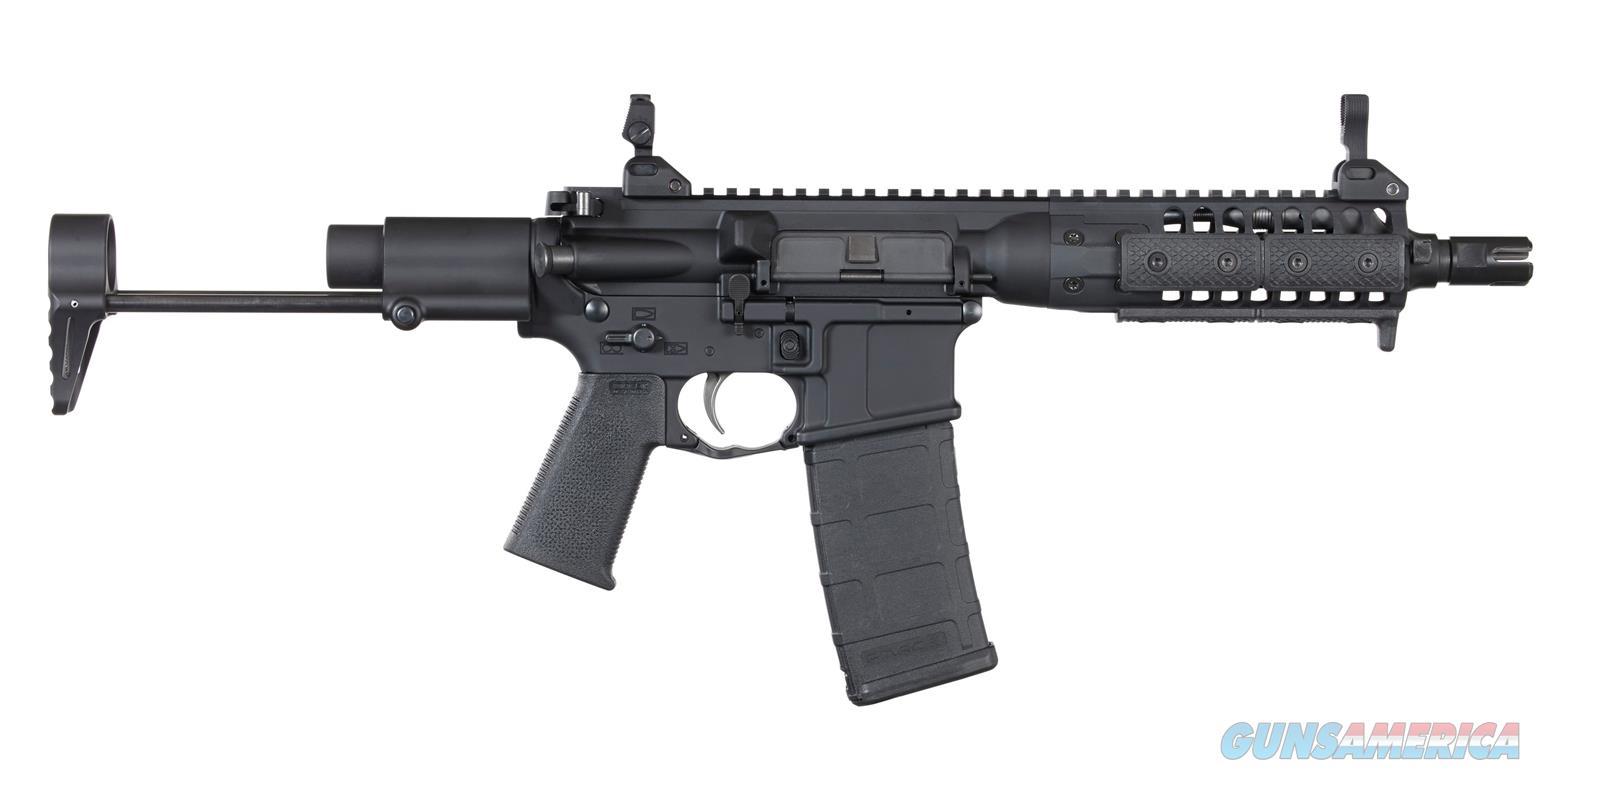 "LWRC IC-PDW 5.56 NATO 8.5"" SBR 30 Rds PDWR5B8IC   Guns > Rifles > Class 3 Rifles > Class 3 Subguns"